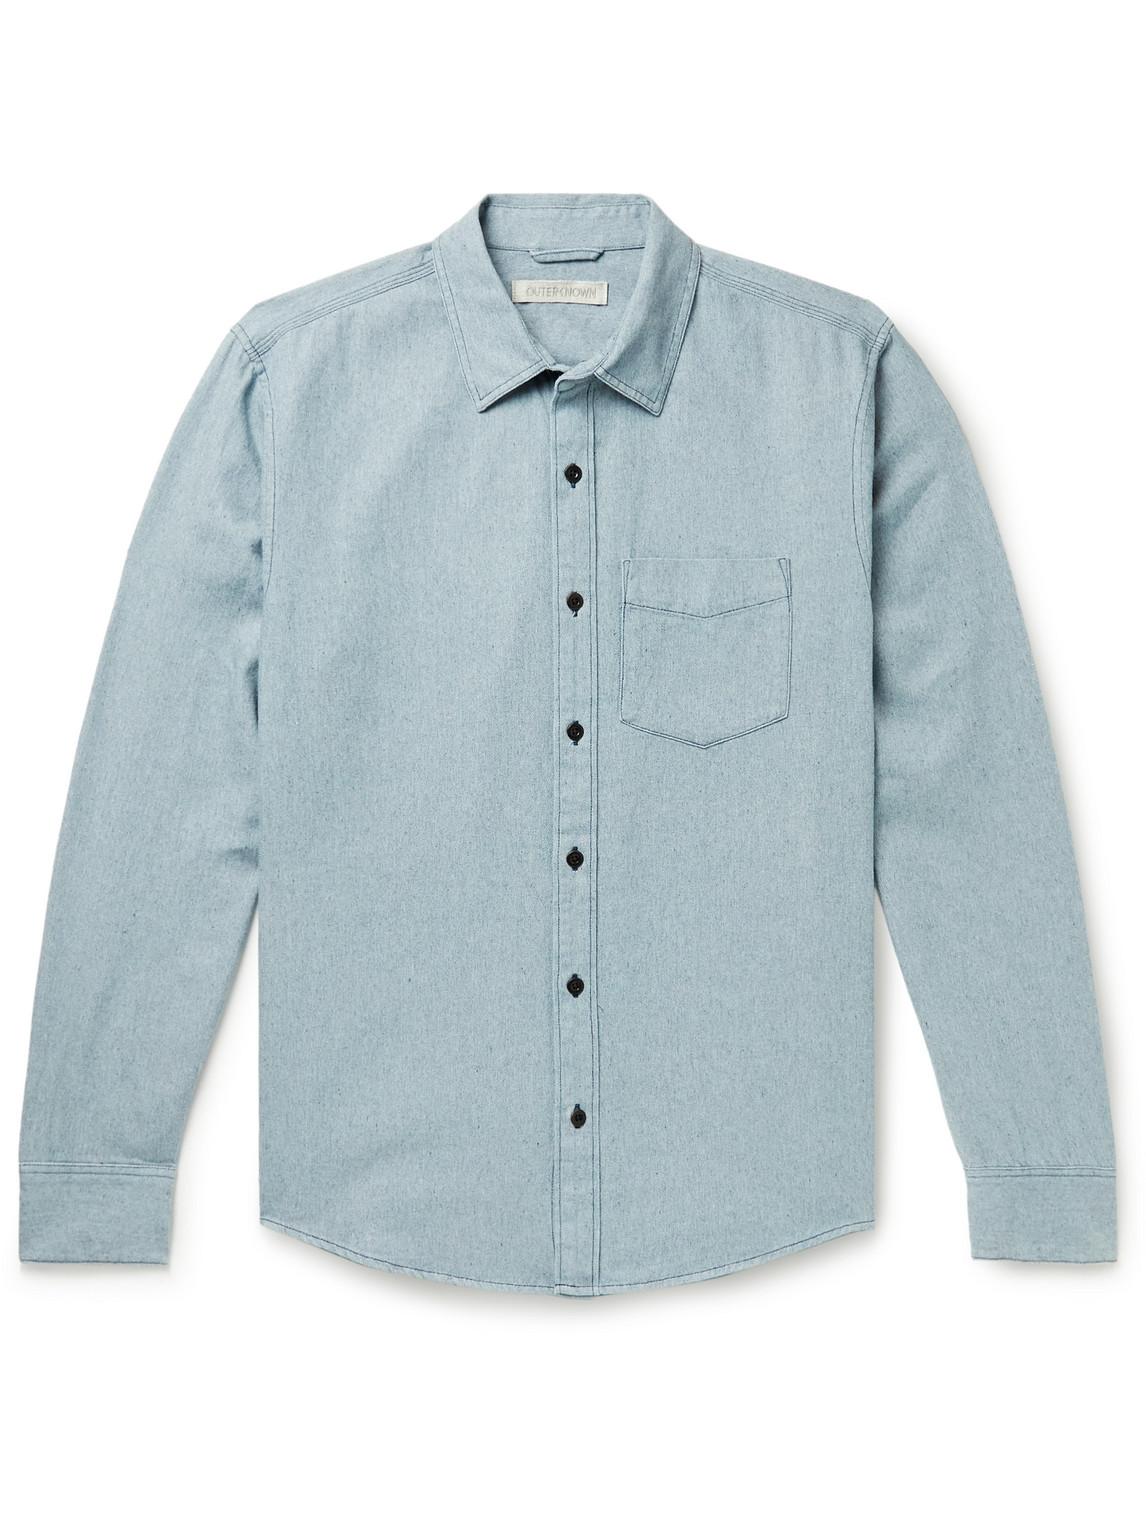 outerknown - cotton-chambray shirt - men - blue - l